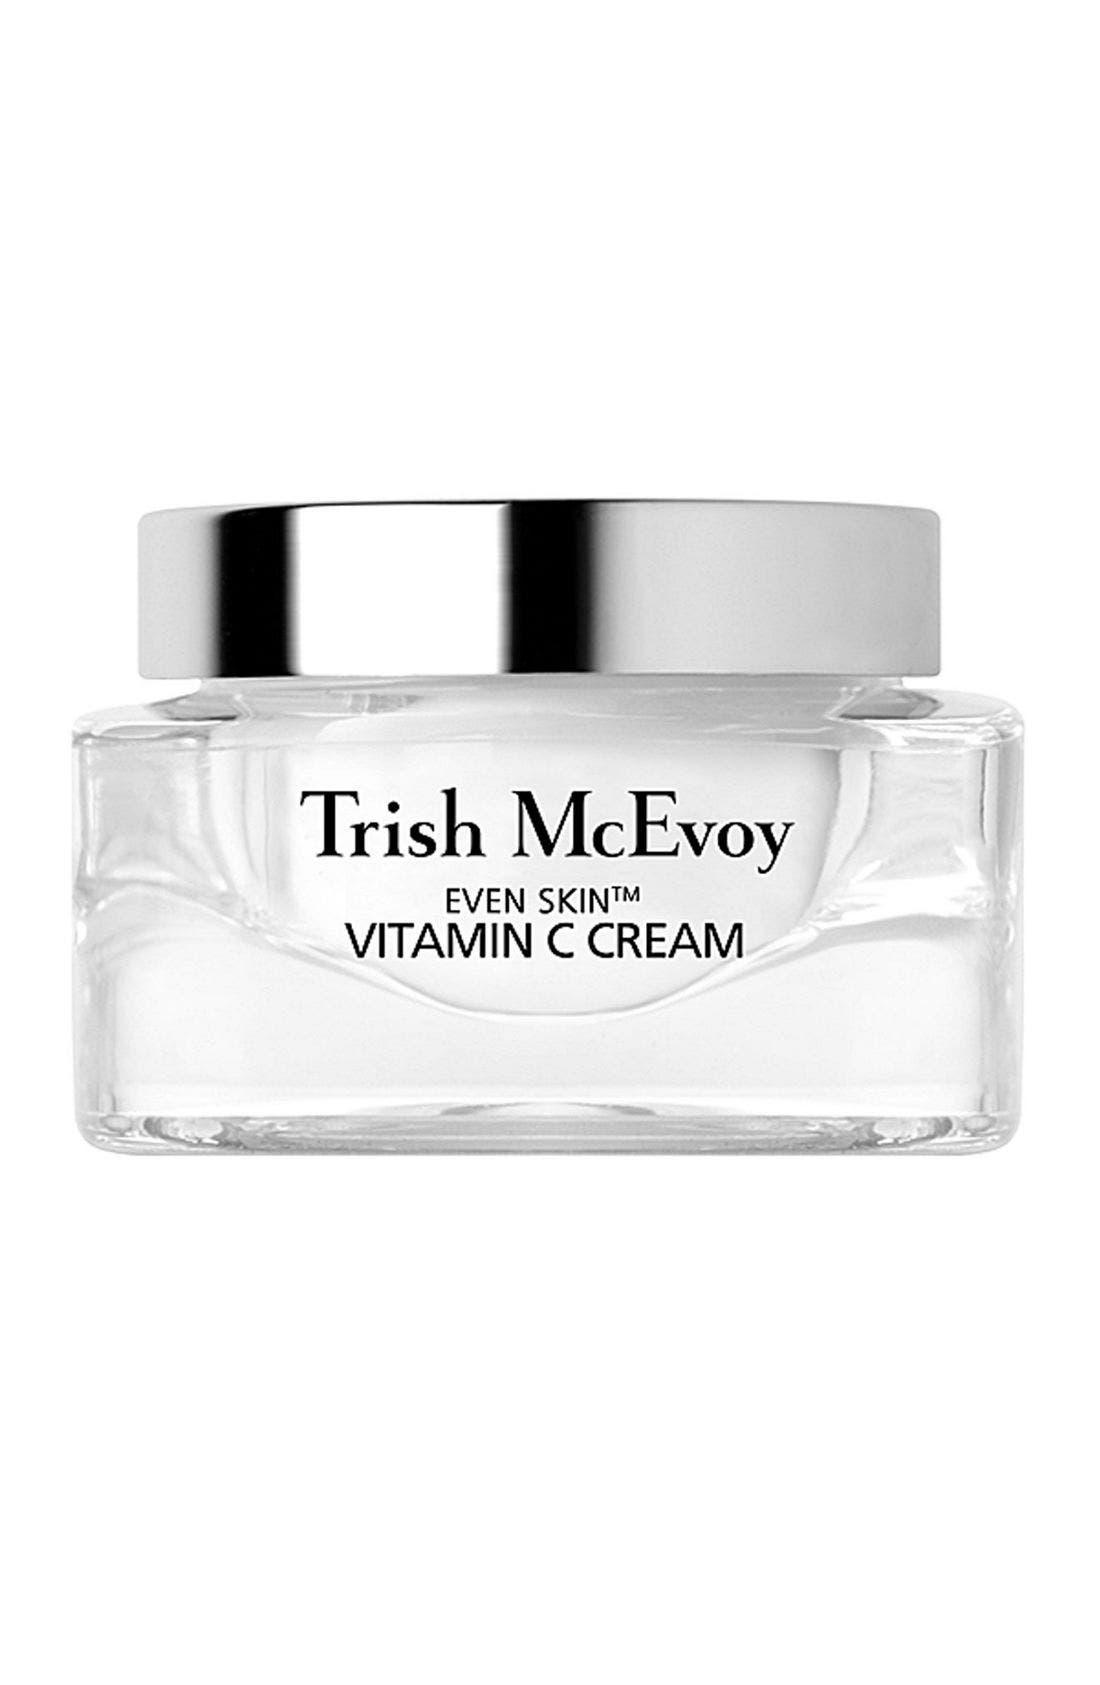 Trish McEvoy 'Even Skin' Vitamin C Cream